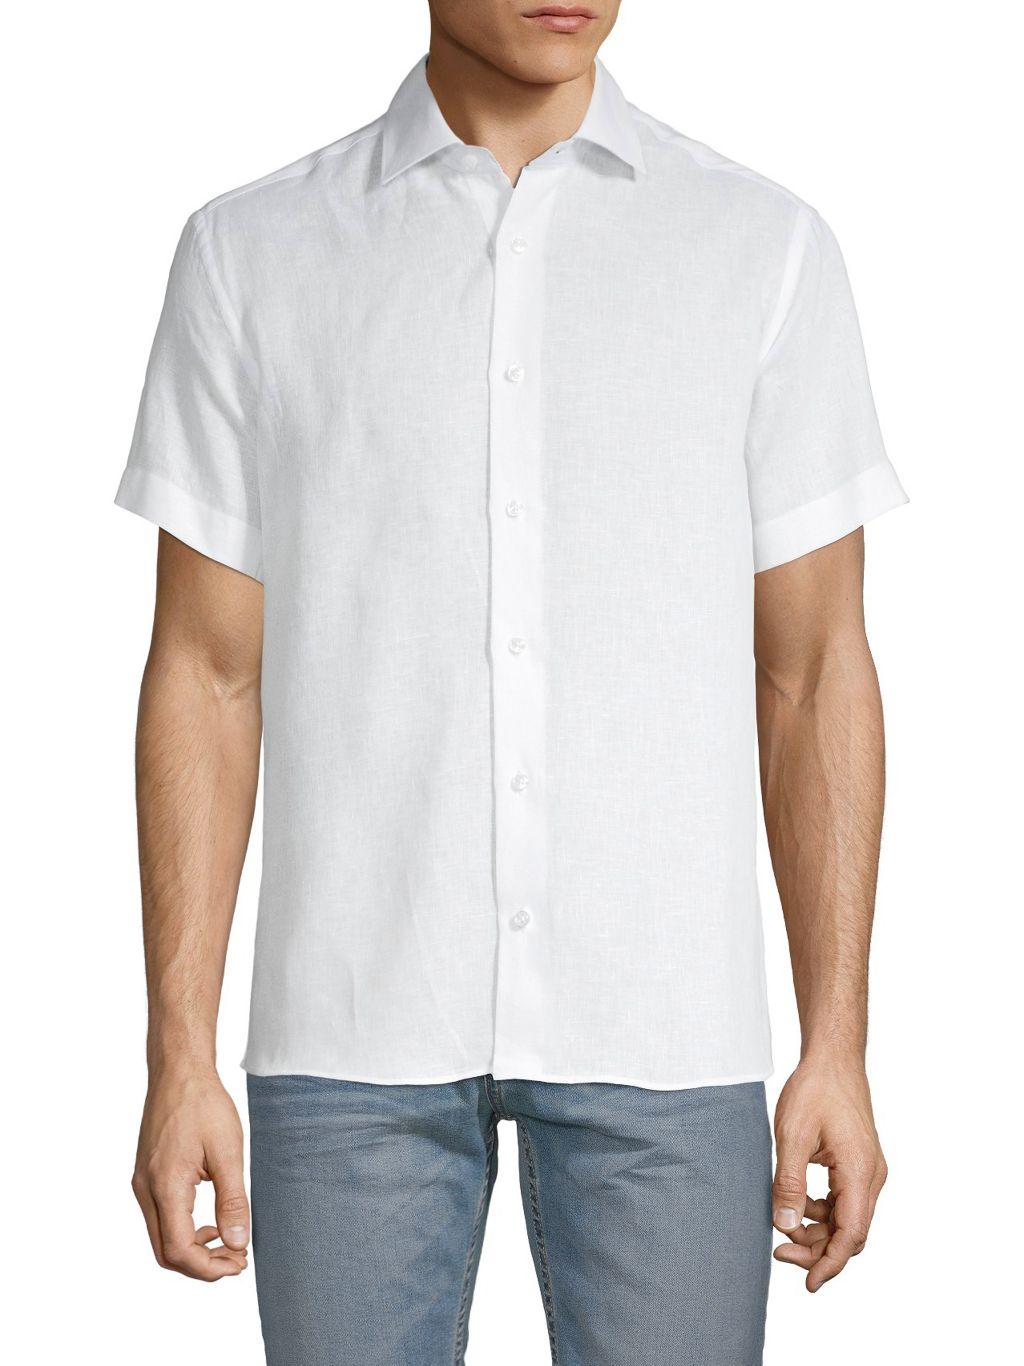 Bertigo Will Solid Linen Short-Sleeve Shirt